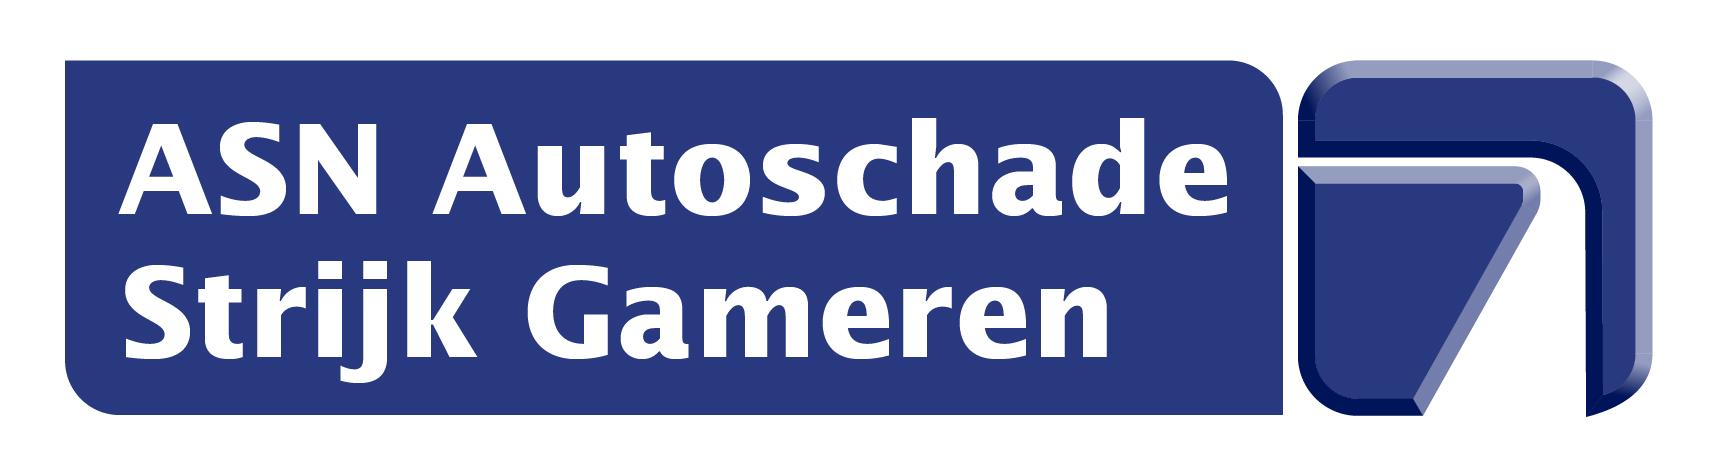 Autoschade Service Strijk Gameren